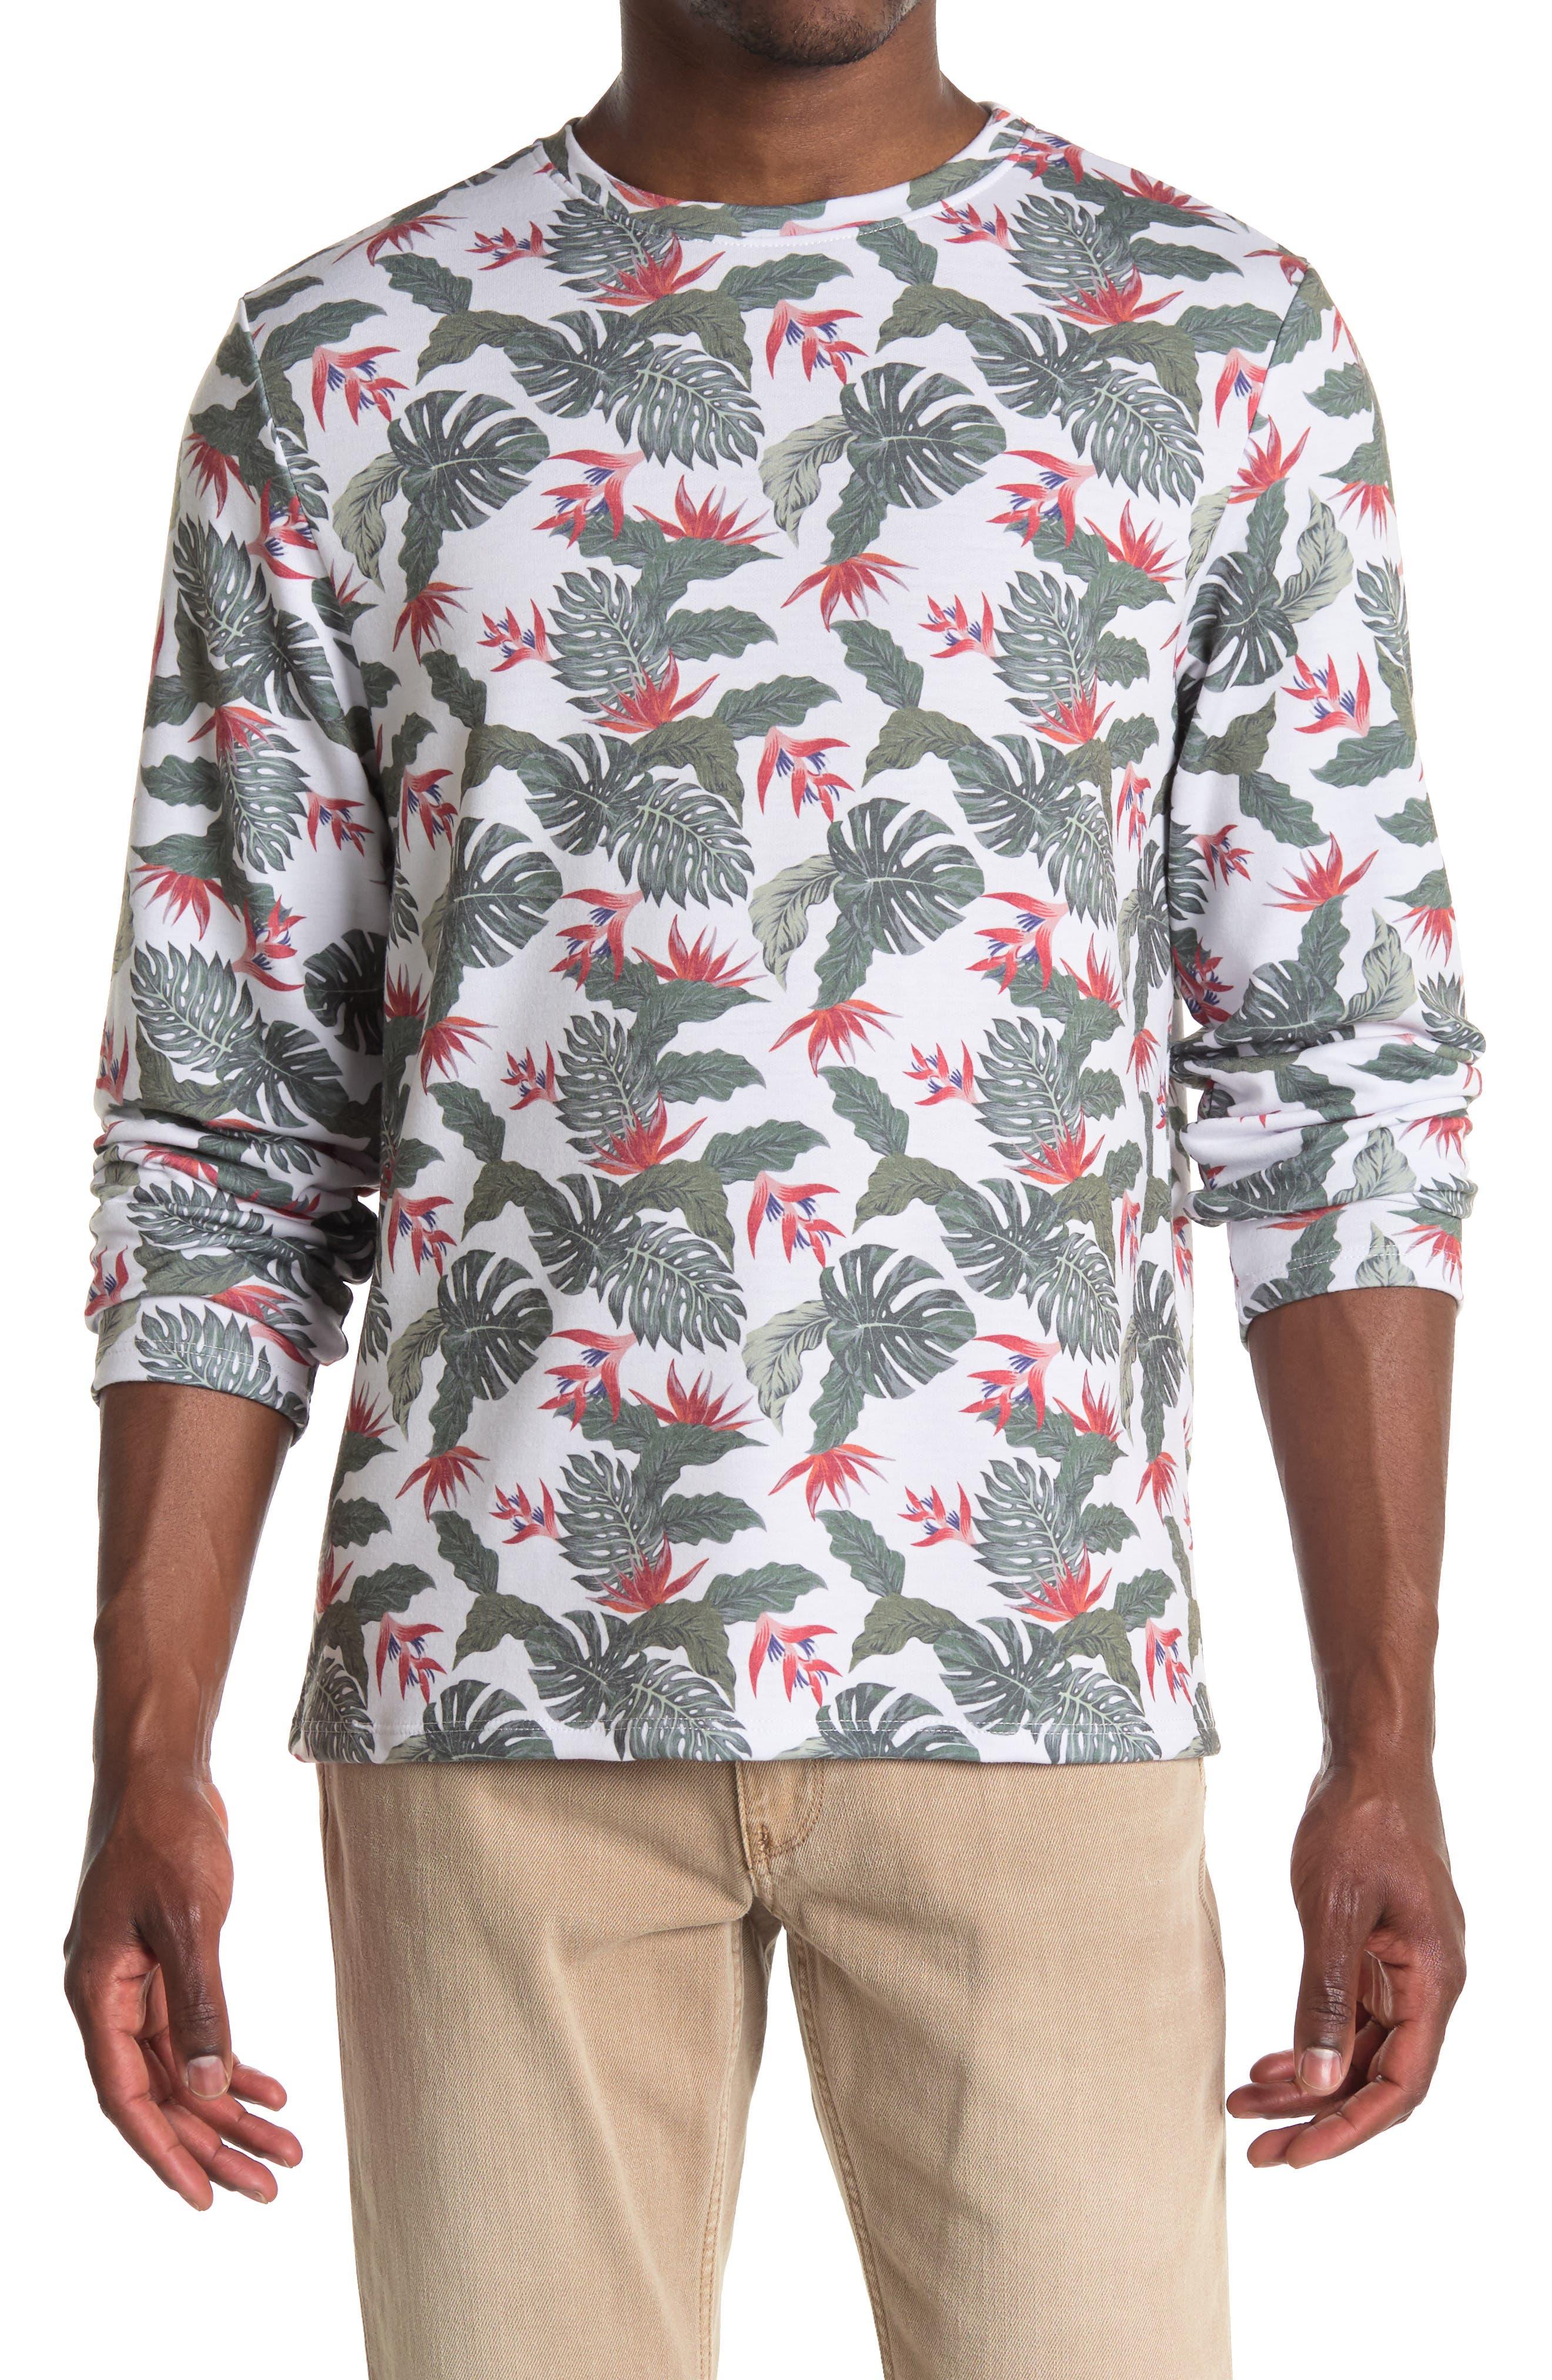 Image of Chillin Dylan Baja Man Printed Long Sleeve Crew Neck T-Shirt